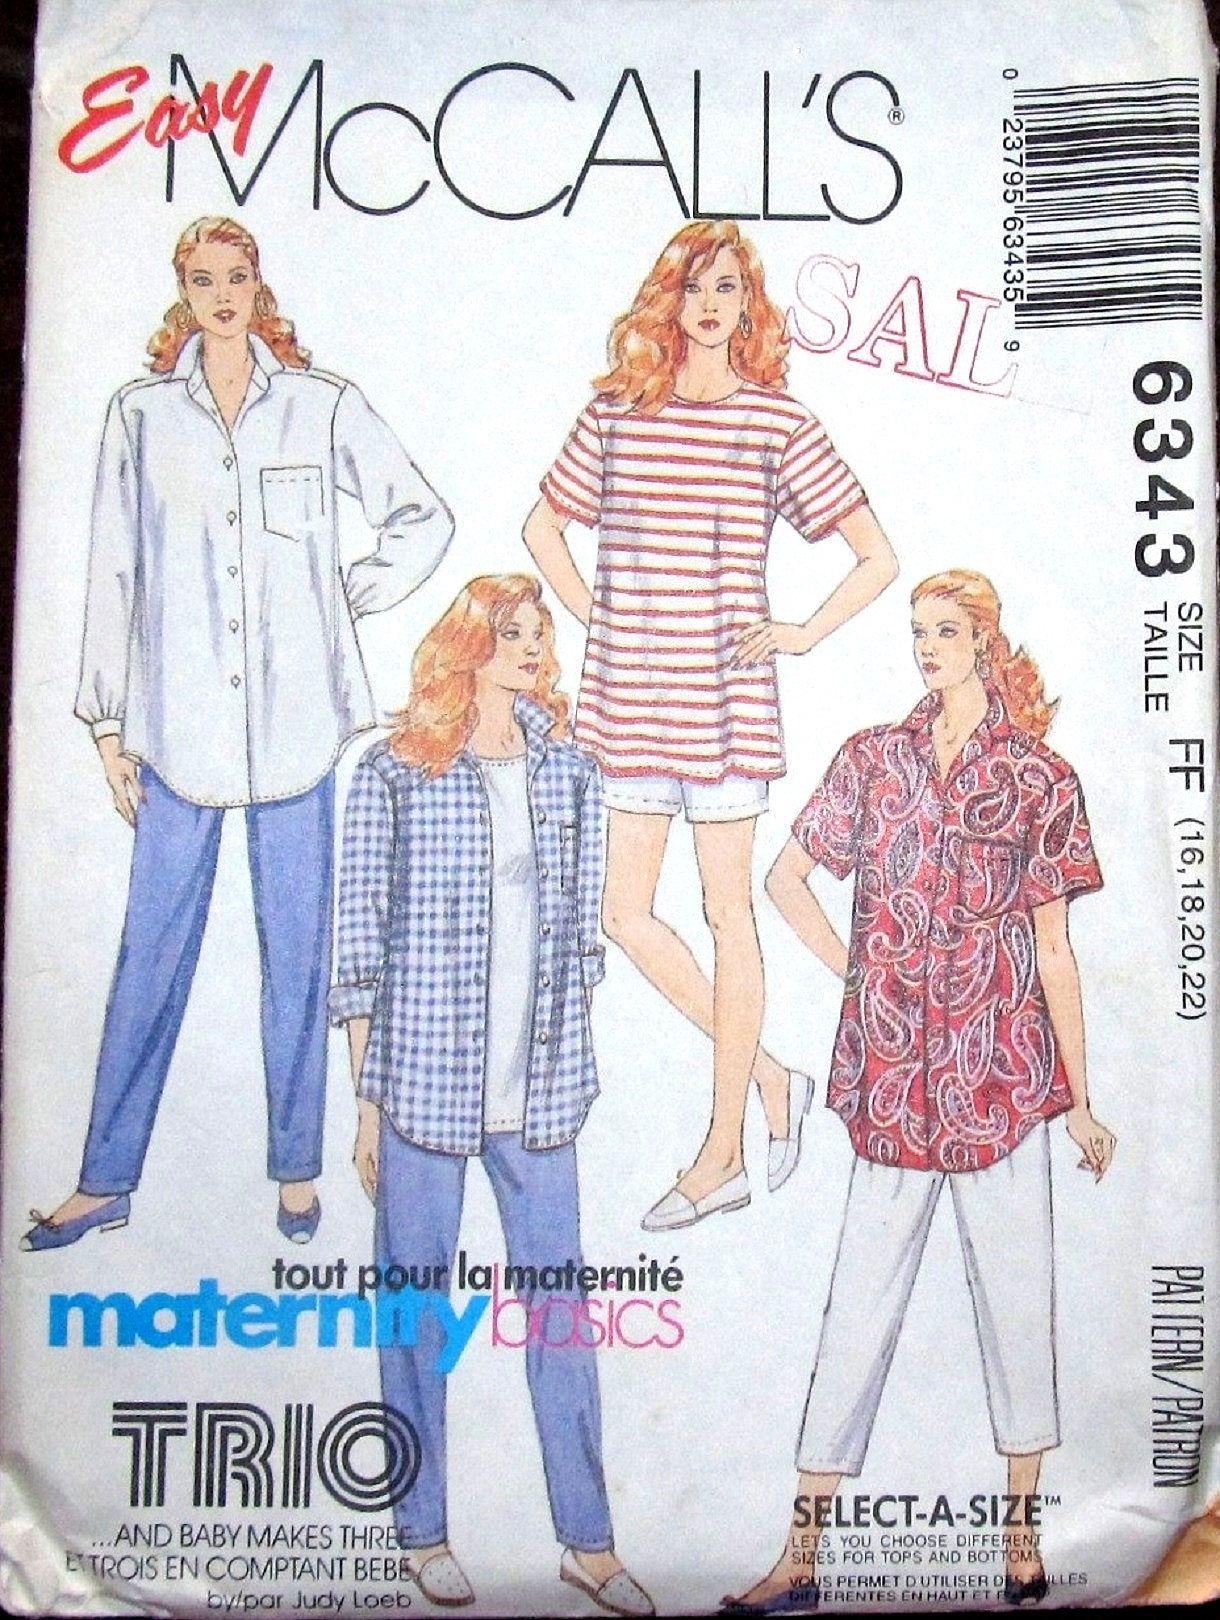 Easy vintage sewing pattern mccalls 6343 maternity top shirt easy vintage sewing pattern mccalls 6343 maternity top shirt pants capris shorts women miss plus size jeuxipadfo Choice Image